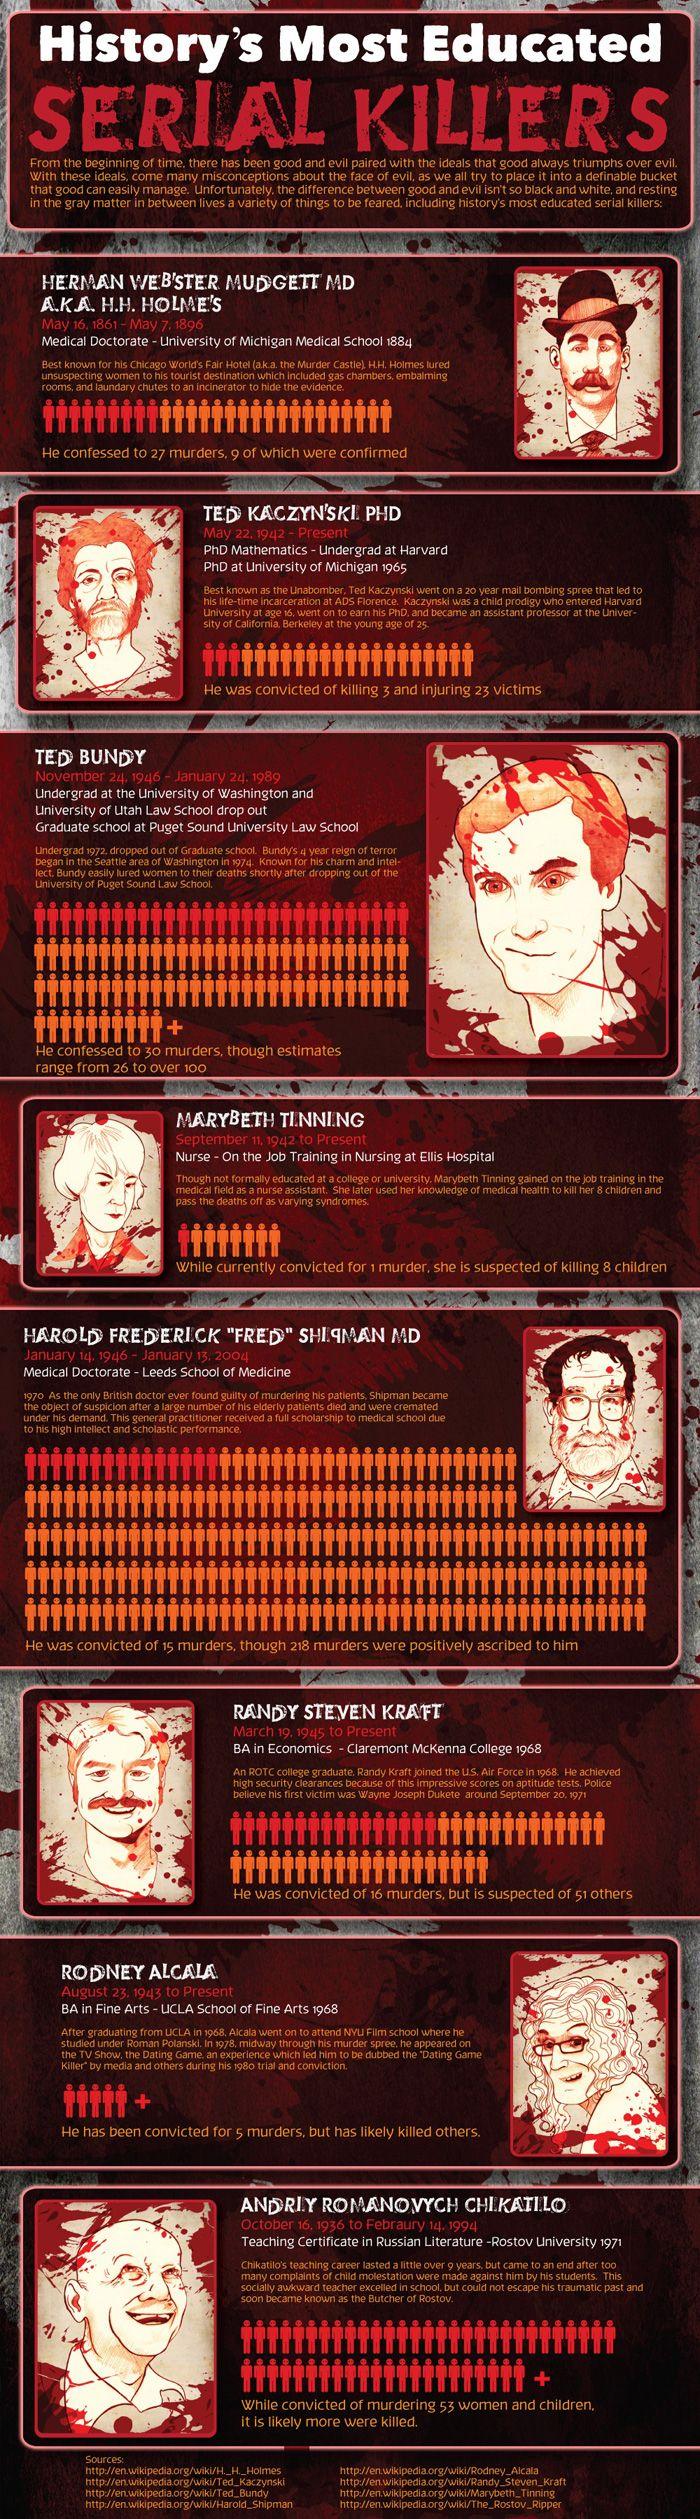 Most Educated Serial Killers: Killers Interesting, Crimehorrorseri Killers, Killers Infographic, True Crime, Education Serial, Serial Killers, Education Infographic, Crime Horror Series Killers, Cold Killers